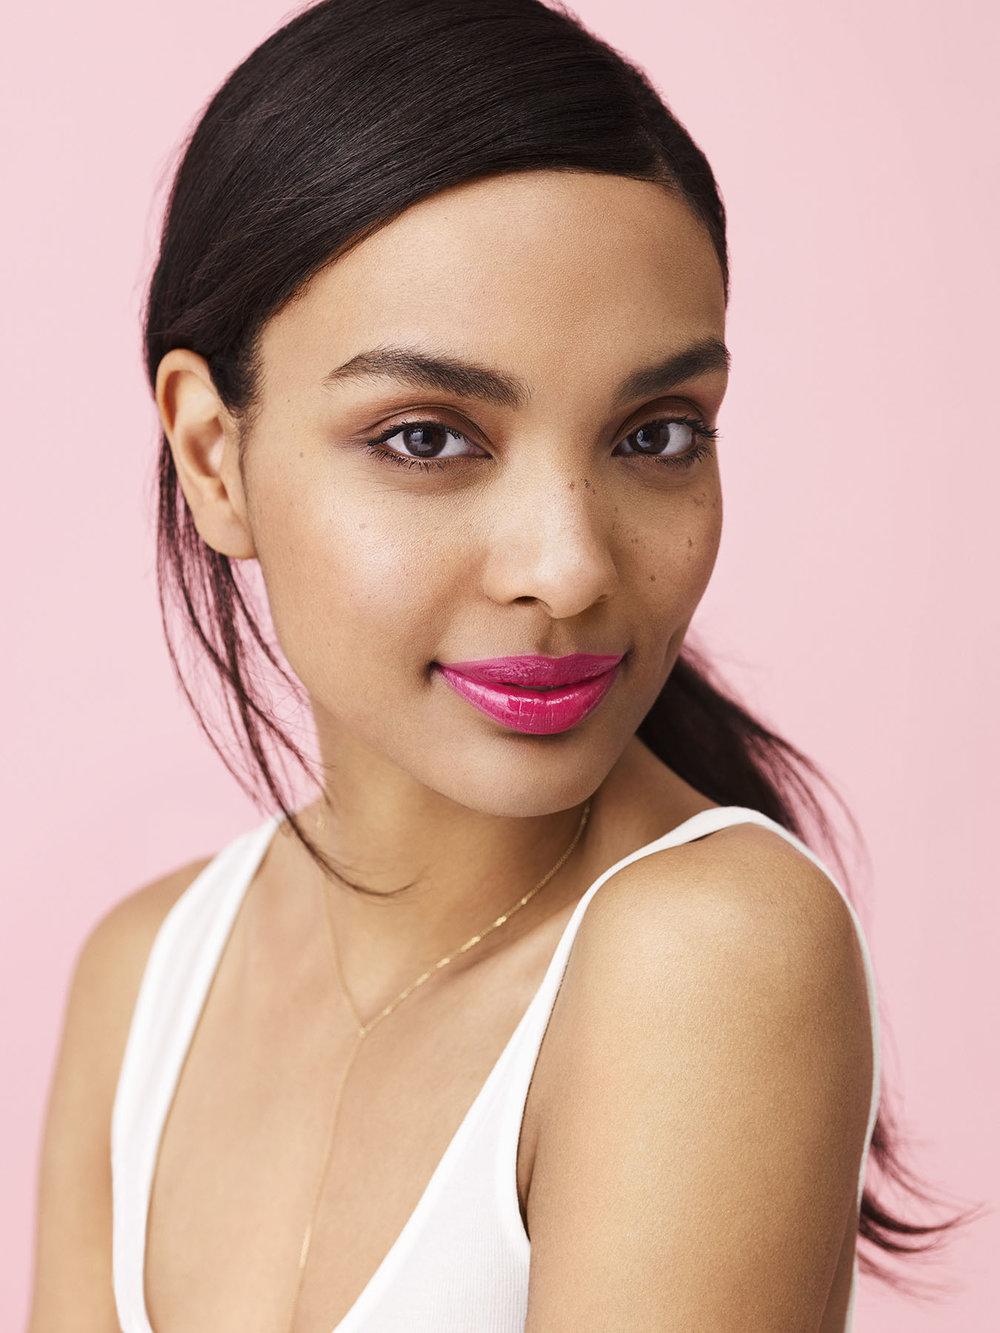 Photo: Nadya Wasylko  Hair: Jeanie Syfu  Makeup: Suzy Gernstein  Wardrobe: Morgan Gibbons  Manicure: Yukie Miyakawa  Model: Jo Elias